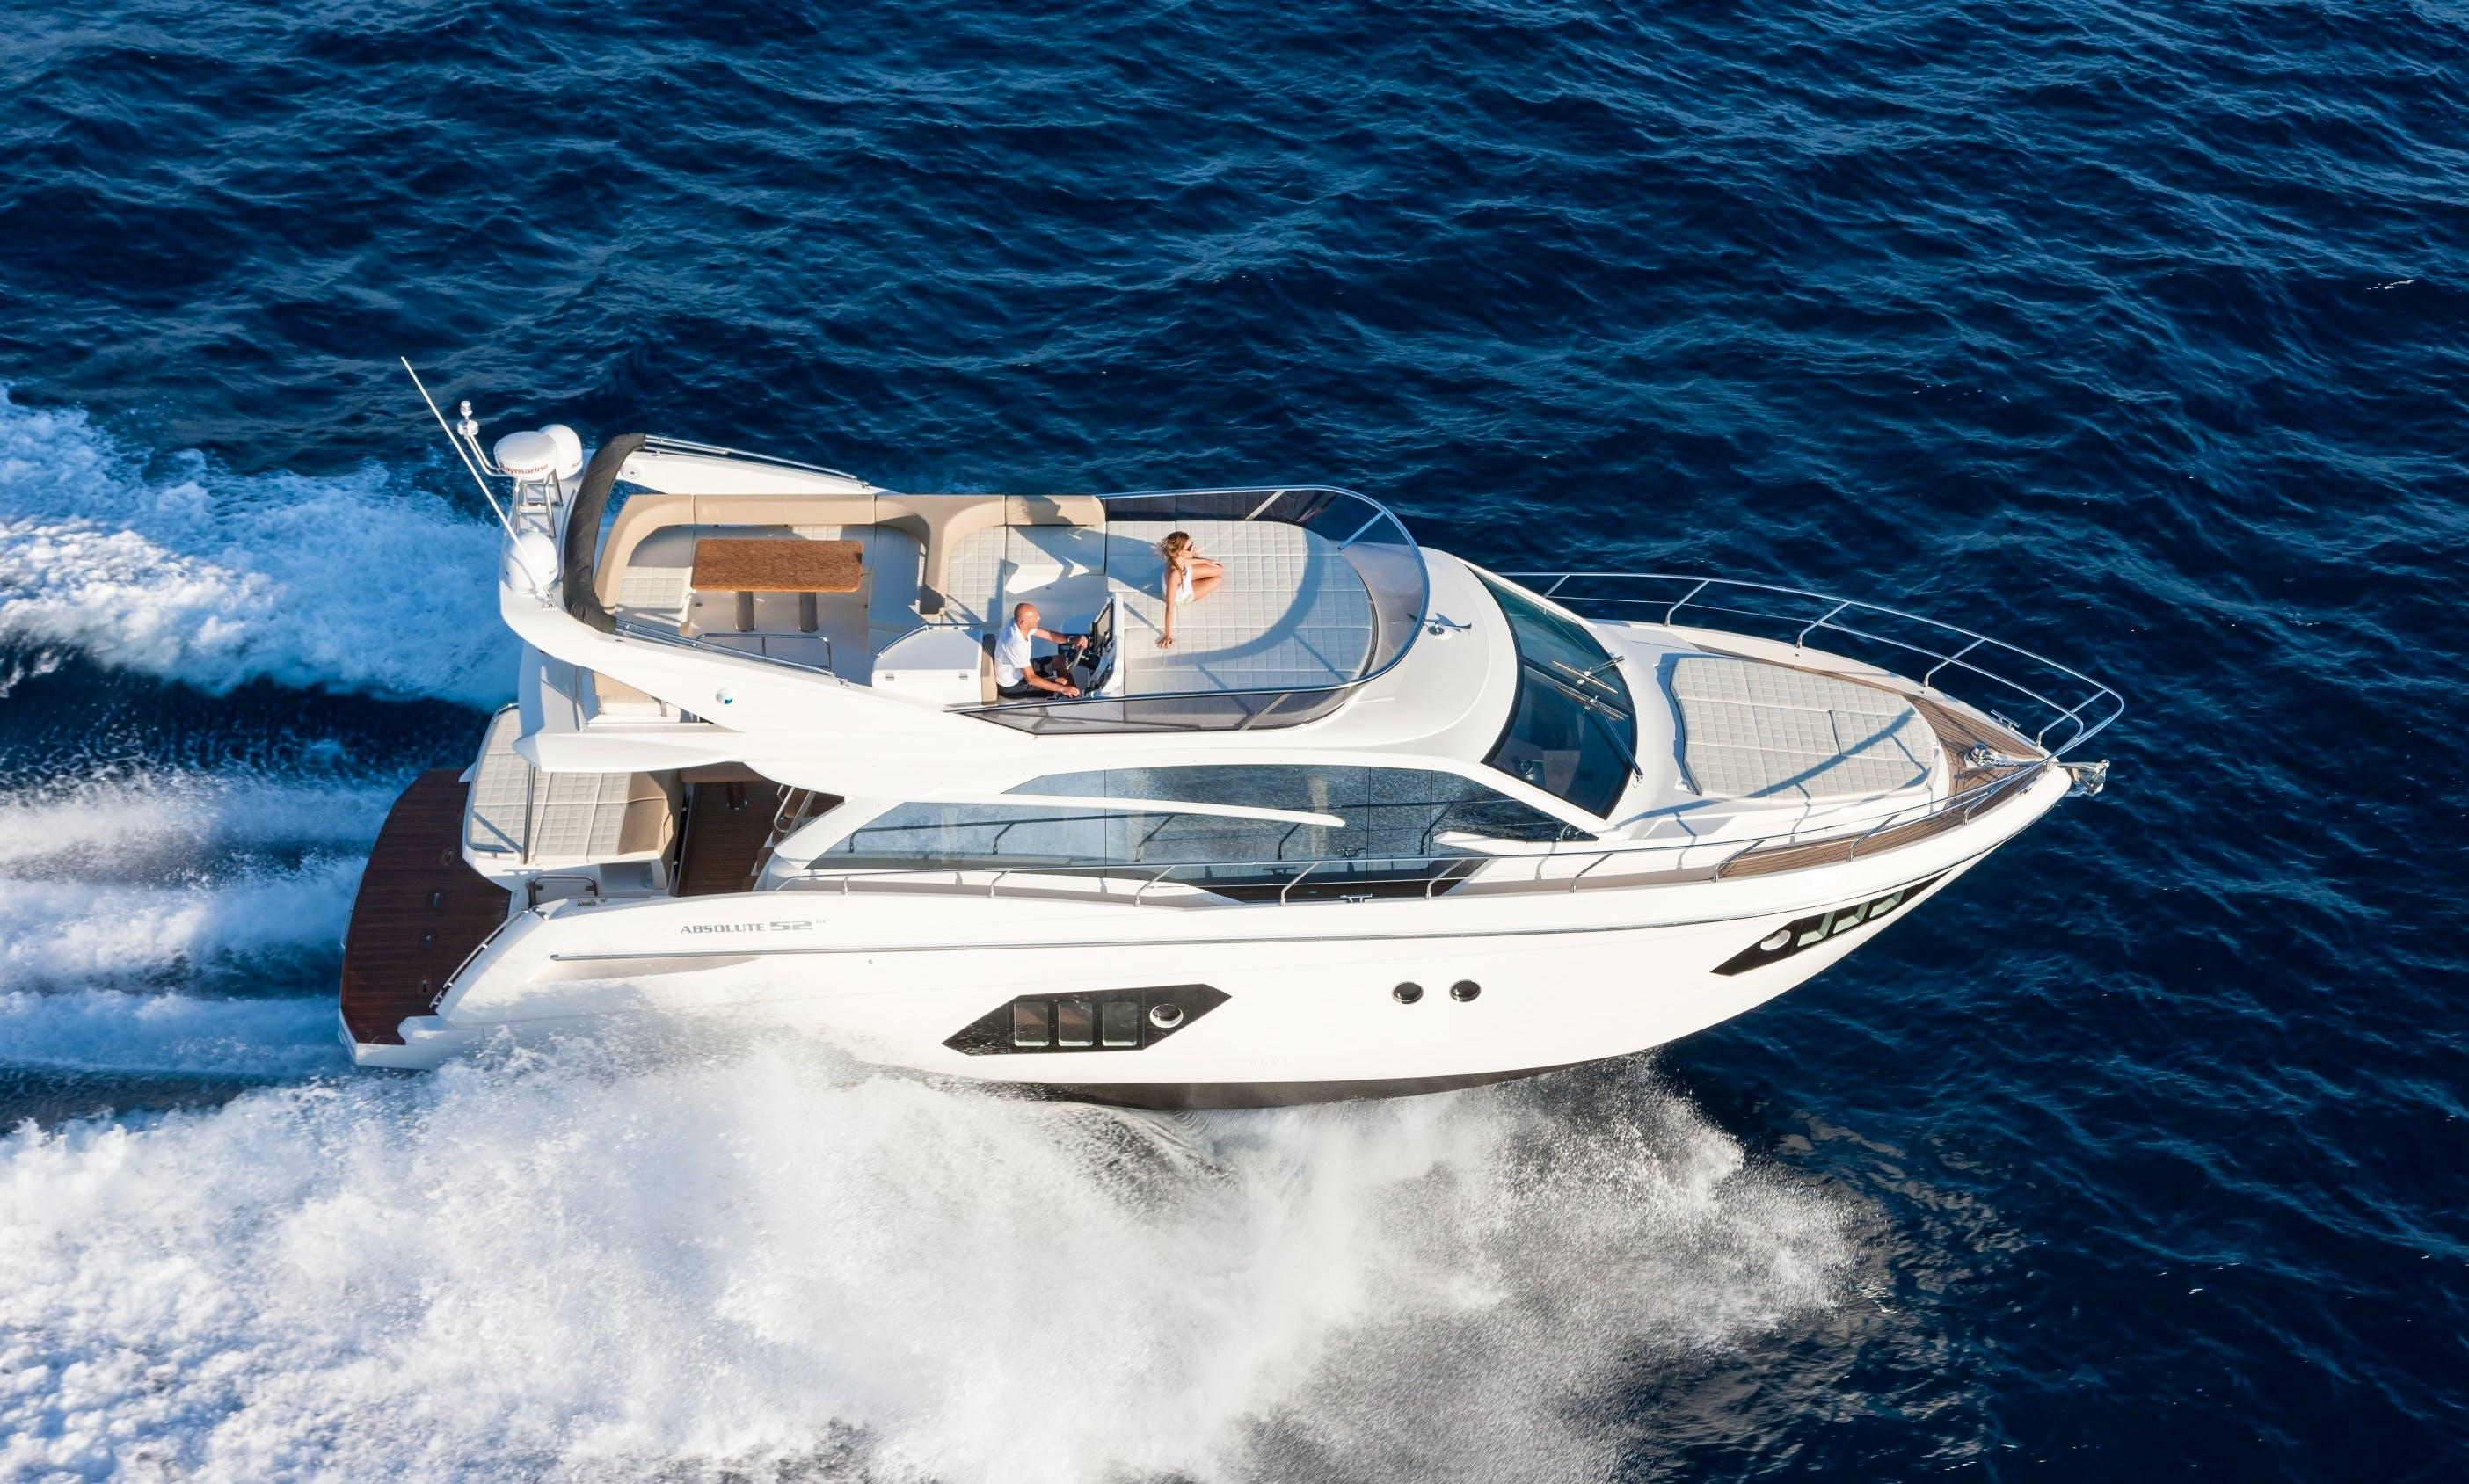 Luxury & brand new yacht of 16 meters